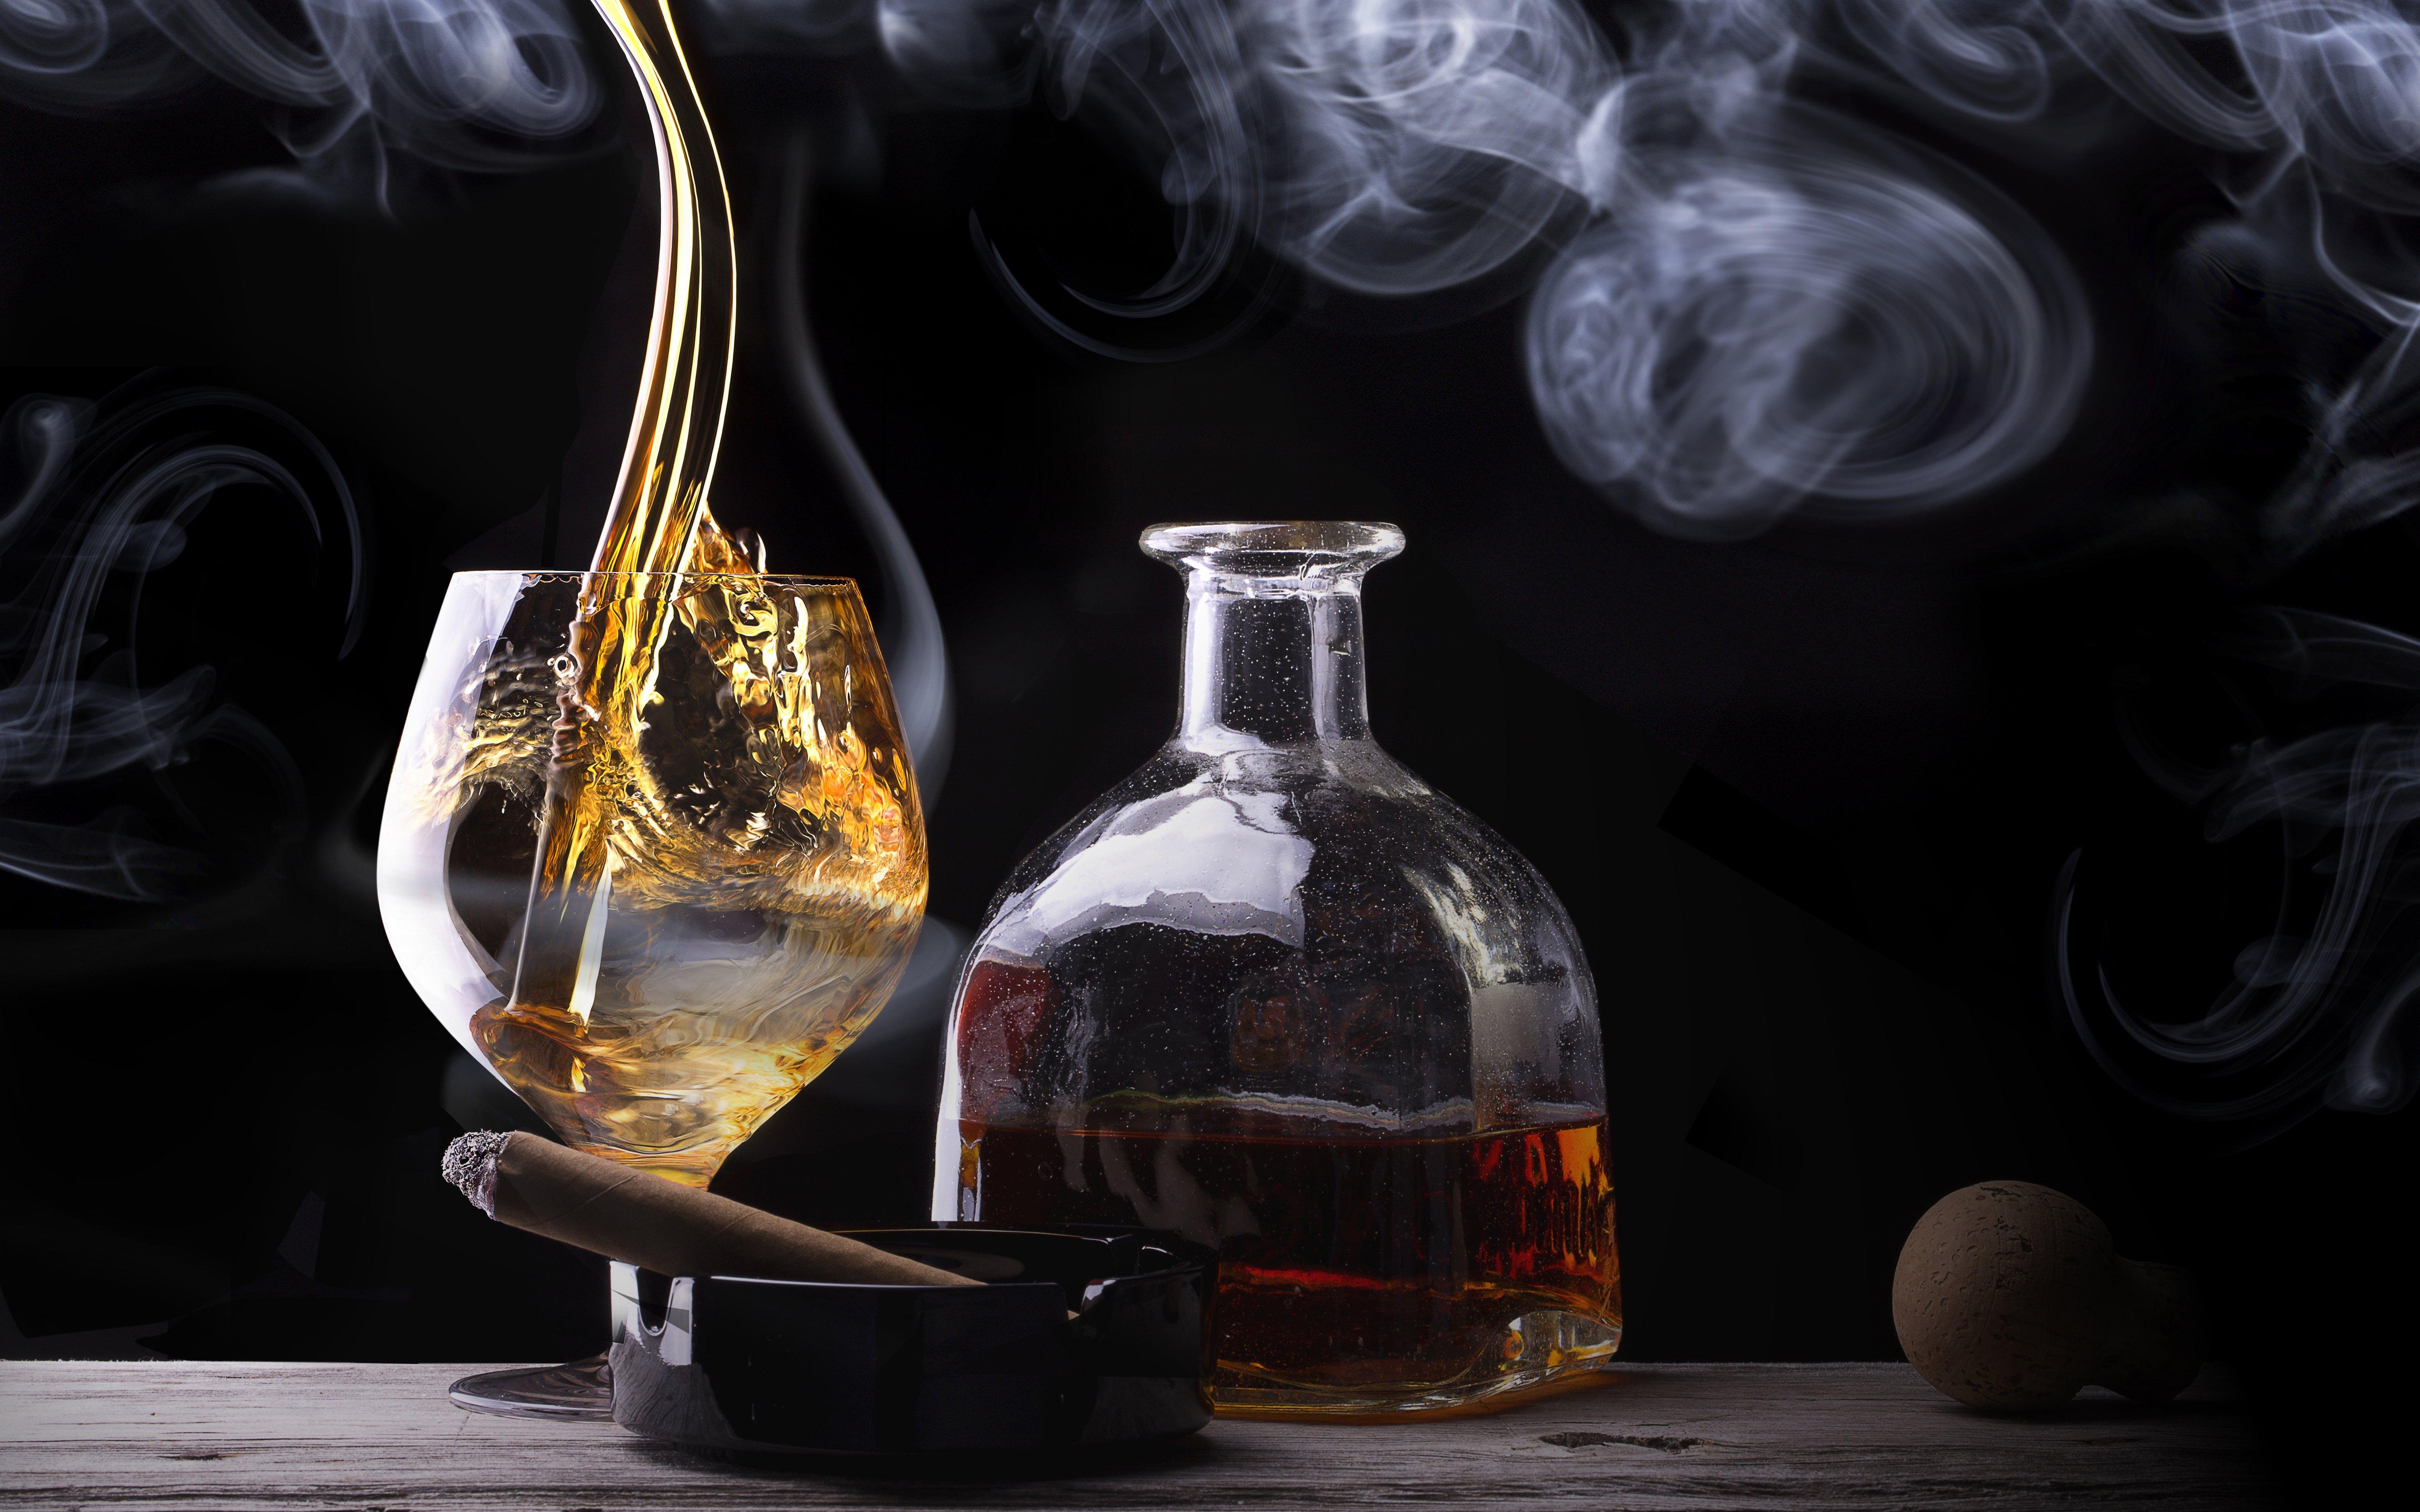 cigar whiskey glass bottle smoke alcohol f wallpaper background 5312x3320